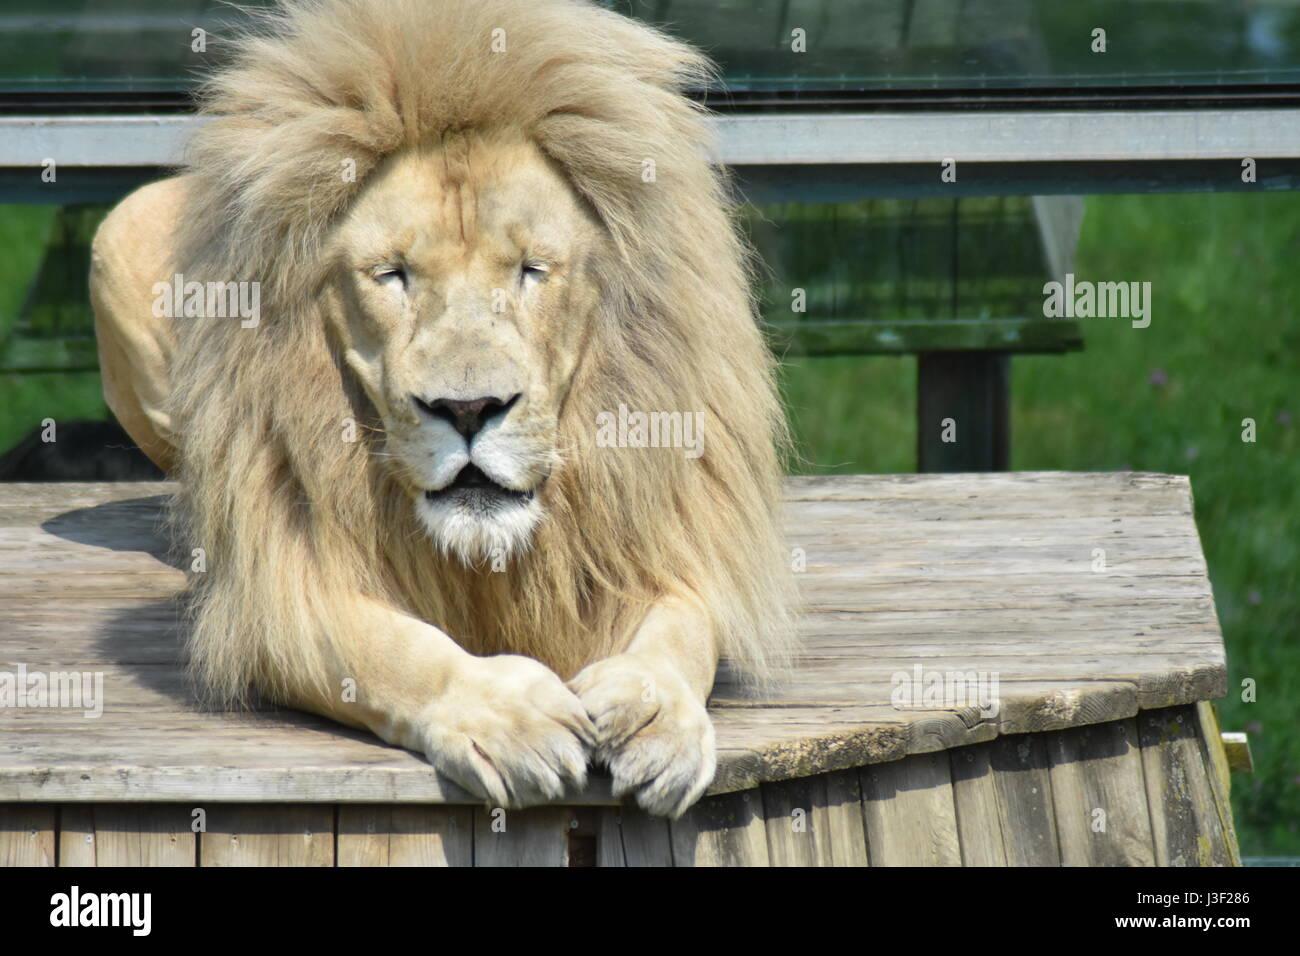 Royal King - Stock Image